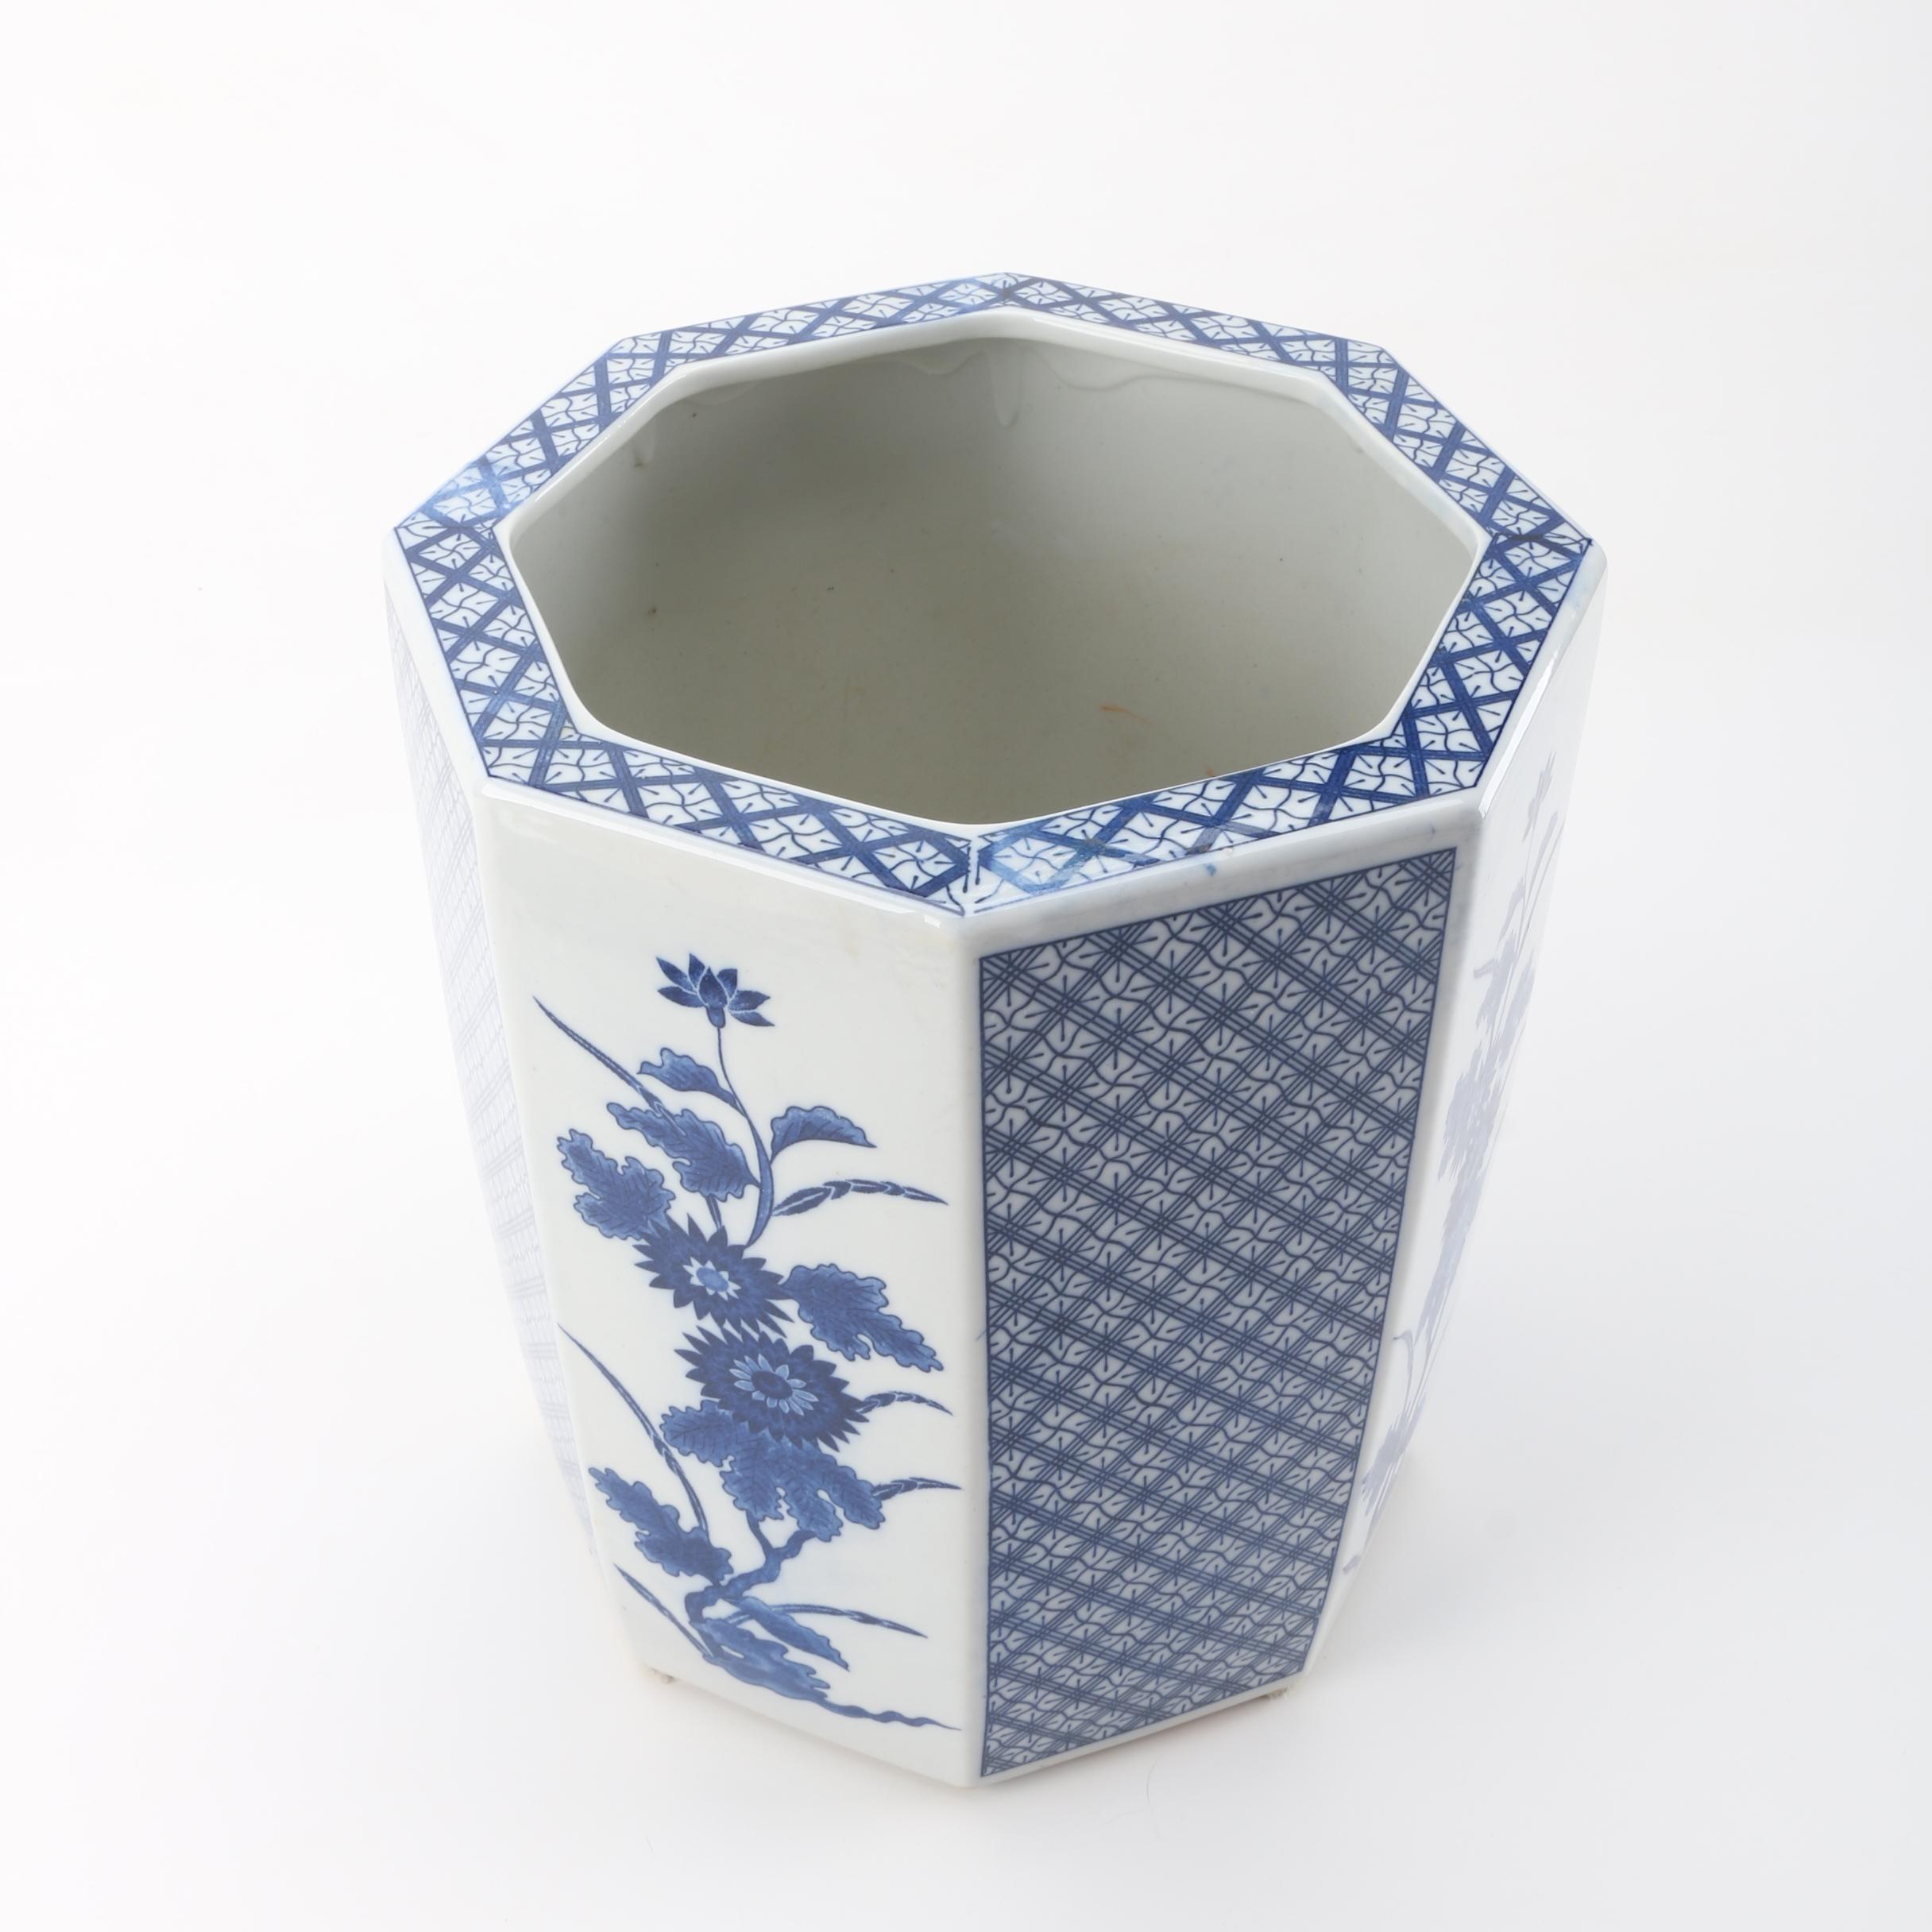 Asian Style Octagonal Blue and White Ceramic Vase